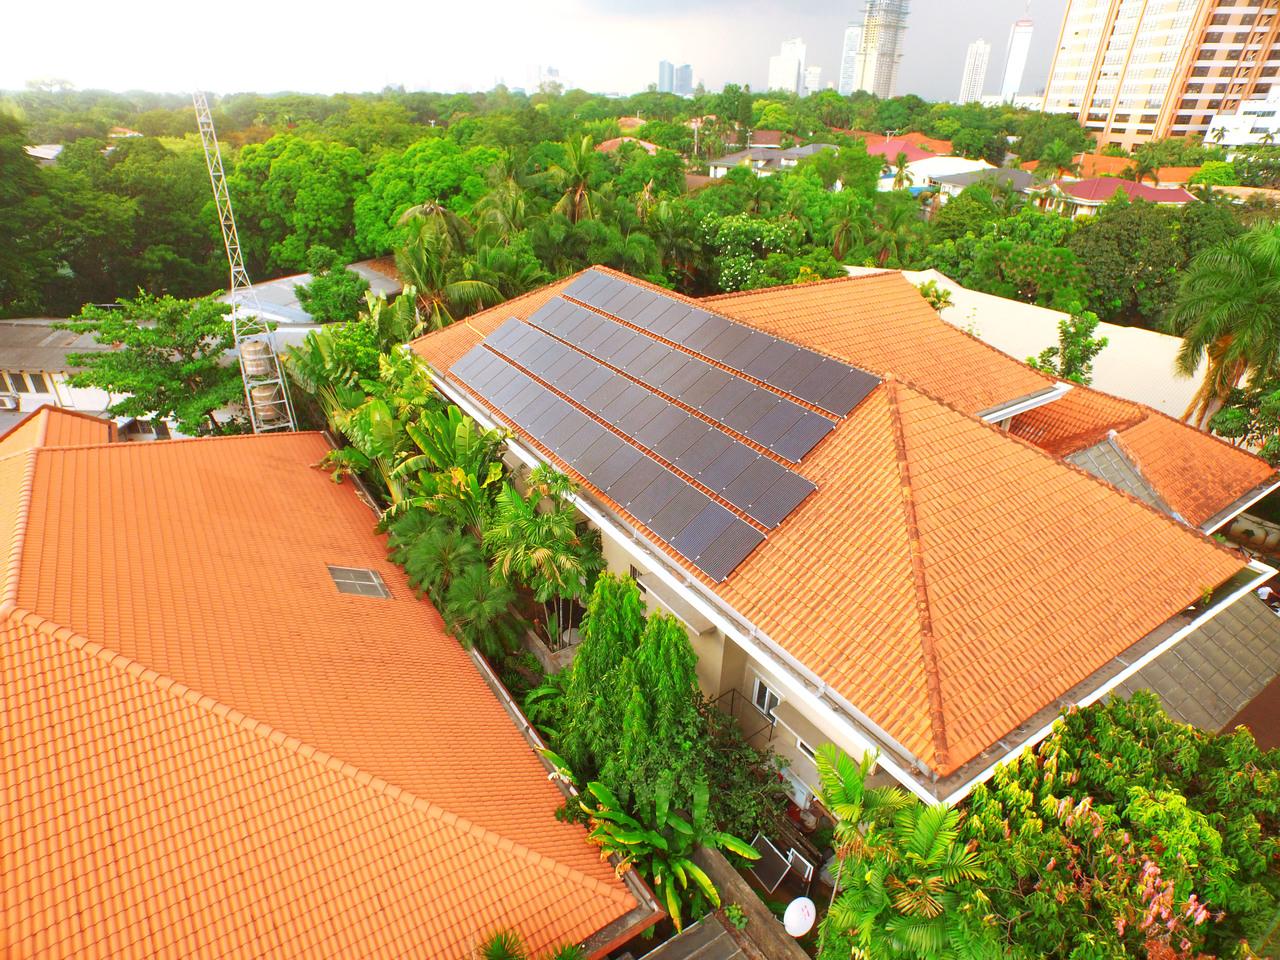 INTEGRATING DESIGN FOR A FUTURE SOLAR BUILD